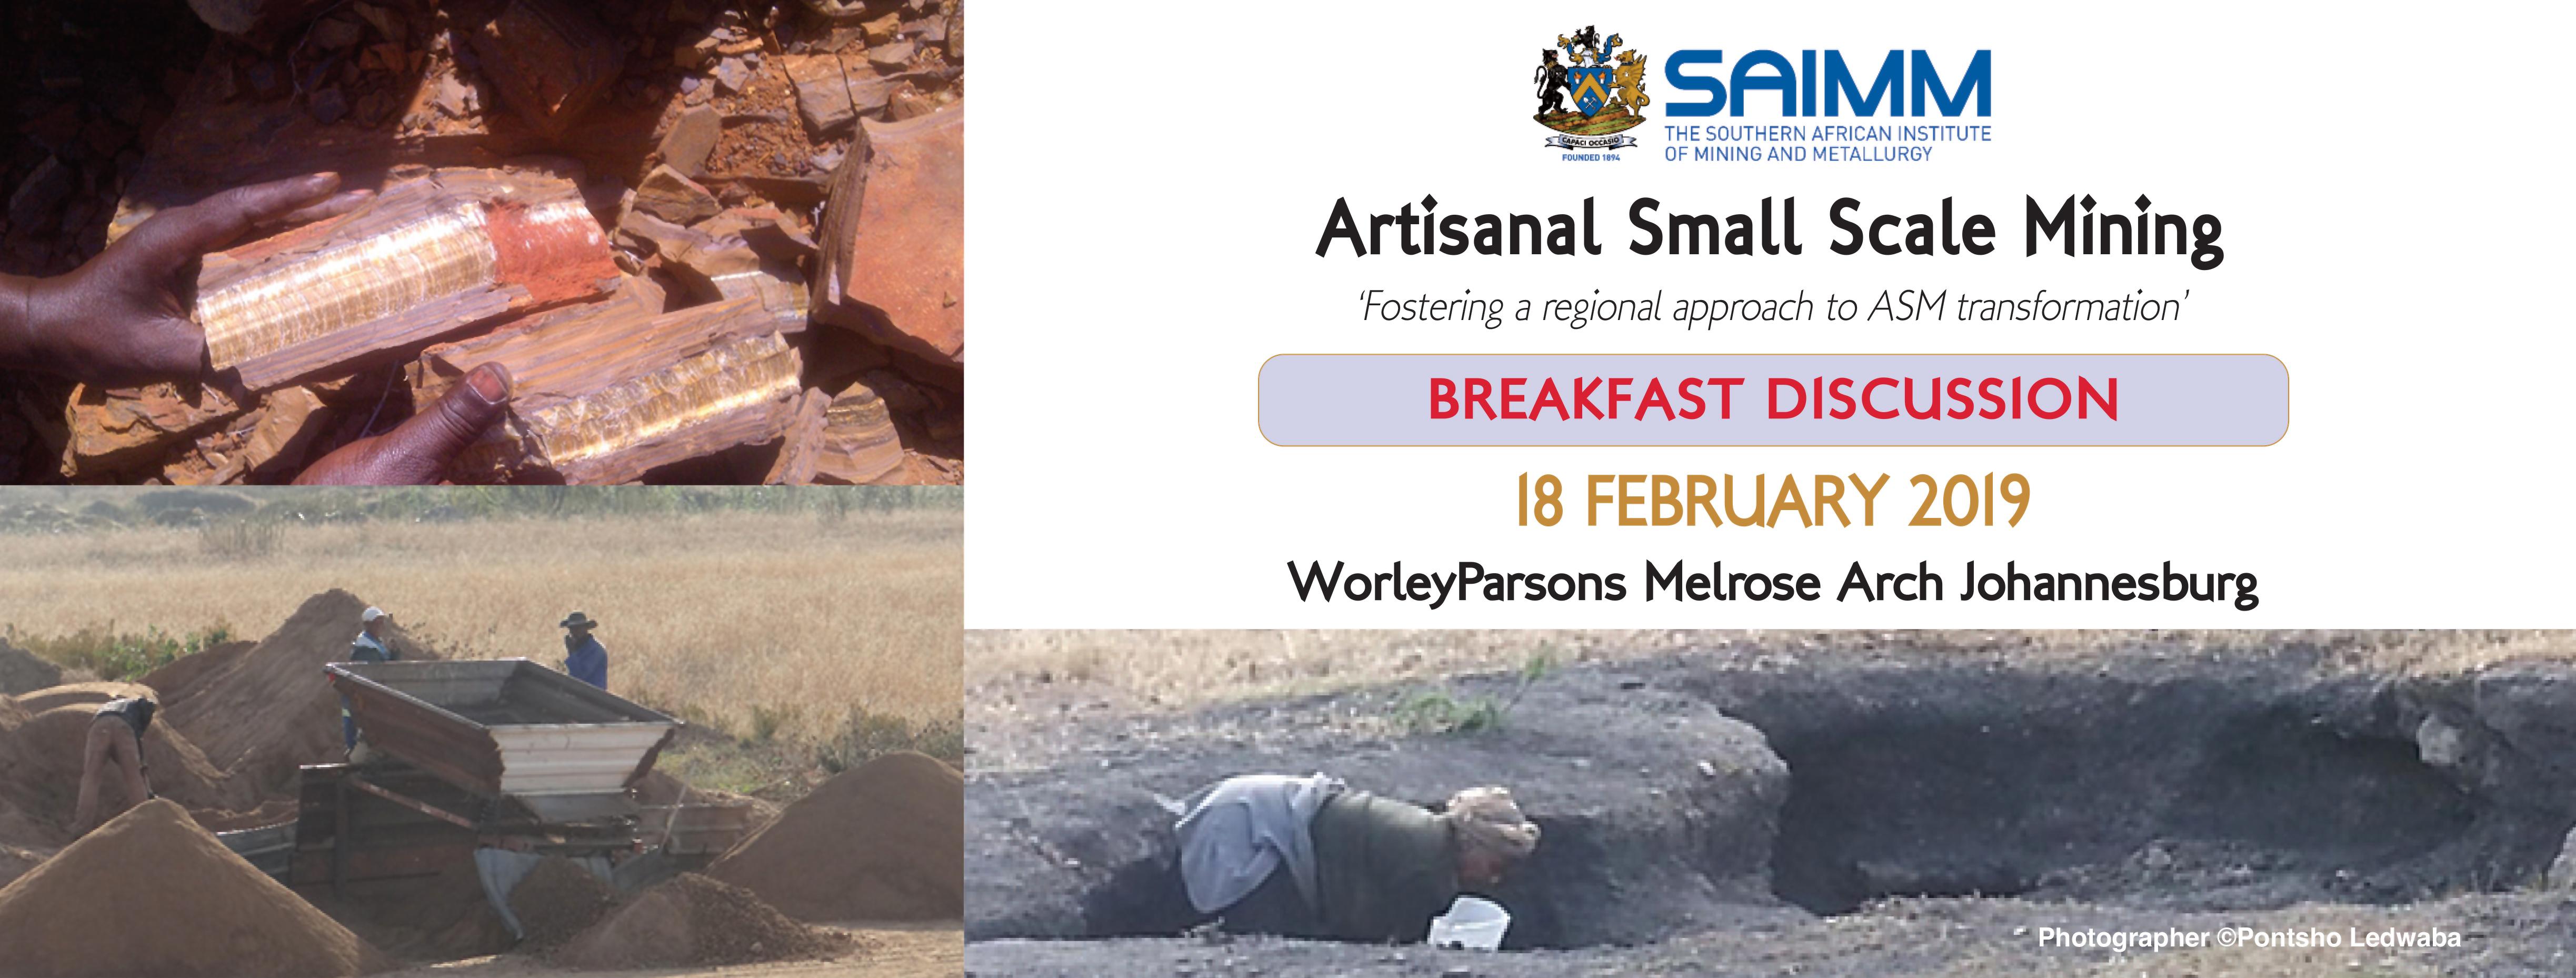 SAIMM - Artisanal Small Scale Mining - Breakfast ...